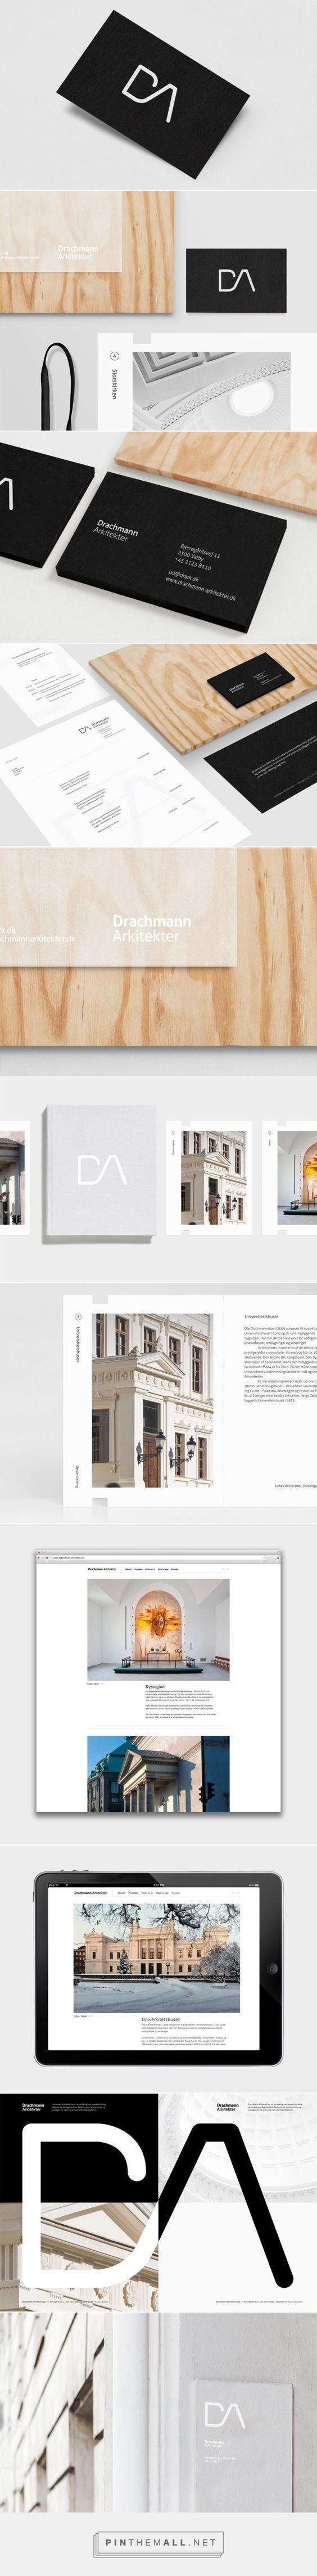 (53) DA Architects on Behance - created via http://pinthemall.net?utm_content=buffer8f8eb&utm_medium=social&utm_source=pinterest.com&utm_campaign=buffer | Branding | Pinterest / Branding / Ideas / Inspiration / BRand / Design / Minimalist / Sleek / Modern / Simple / B&W / Gray / Architecture Office